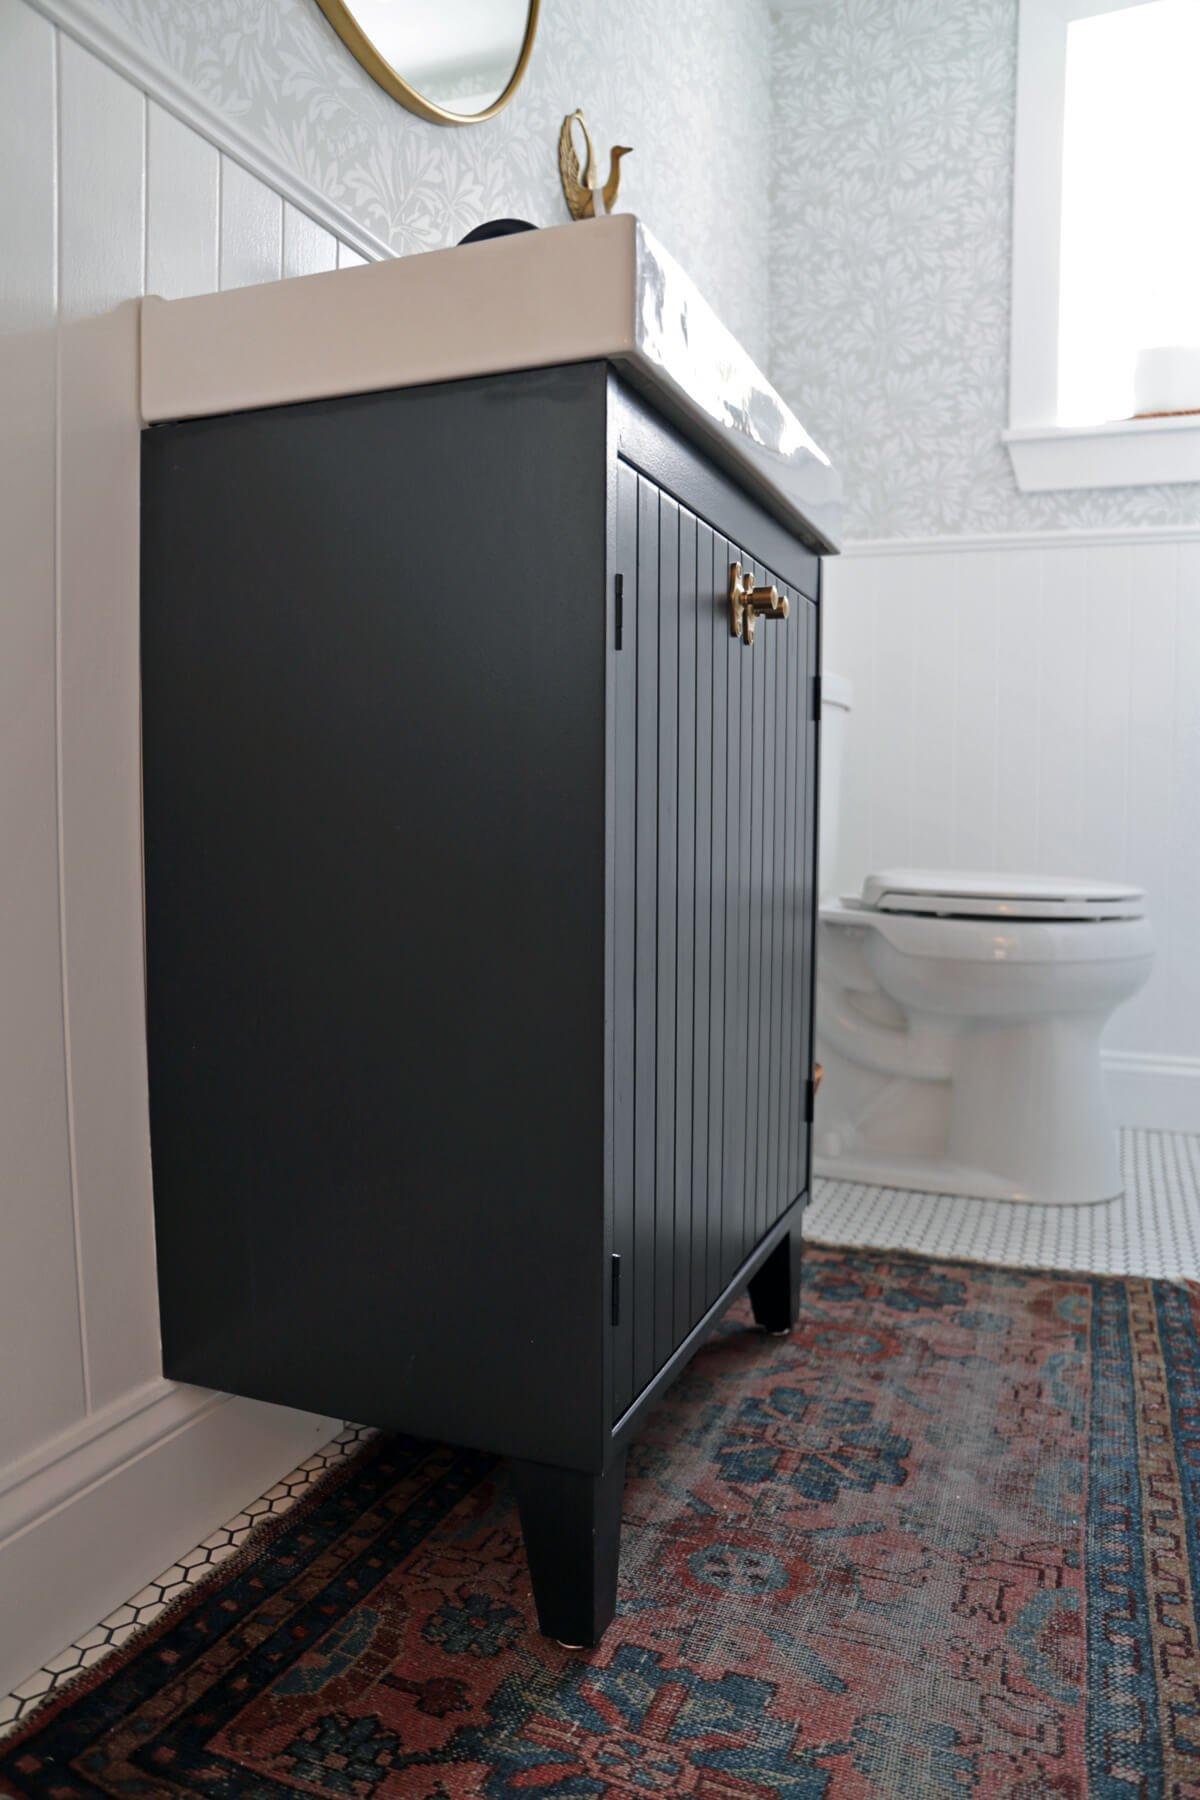 Customizing an IKEA Vanity for a Bungalow Bathroom